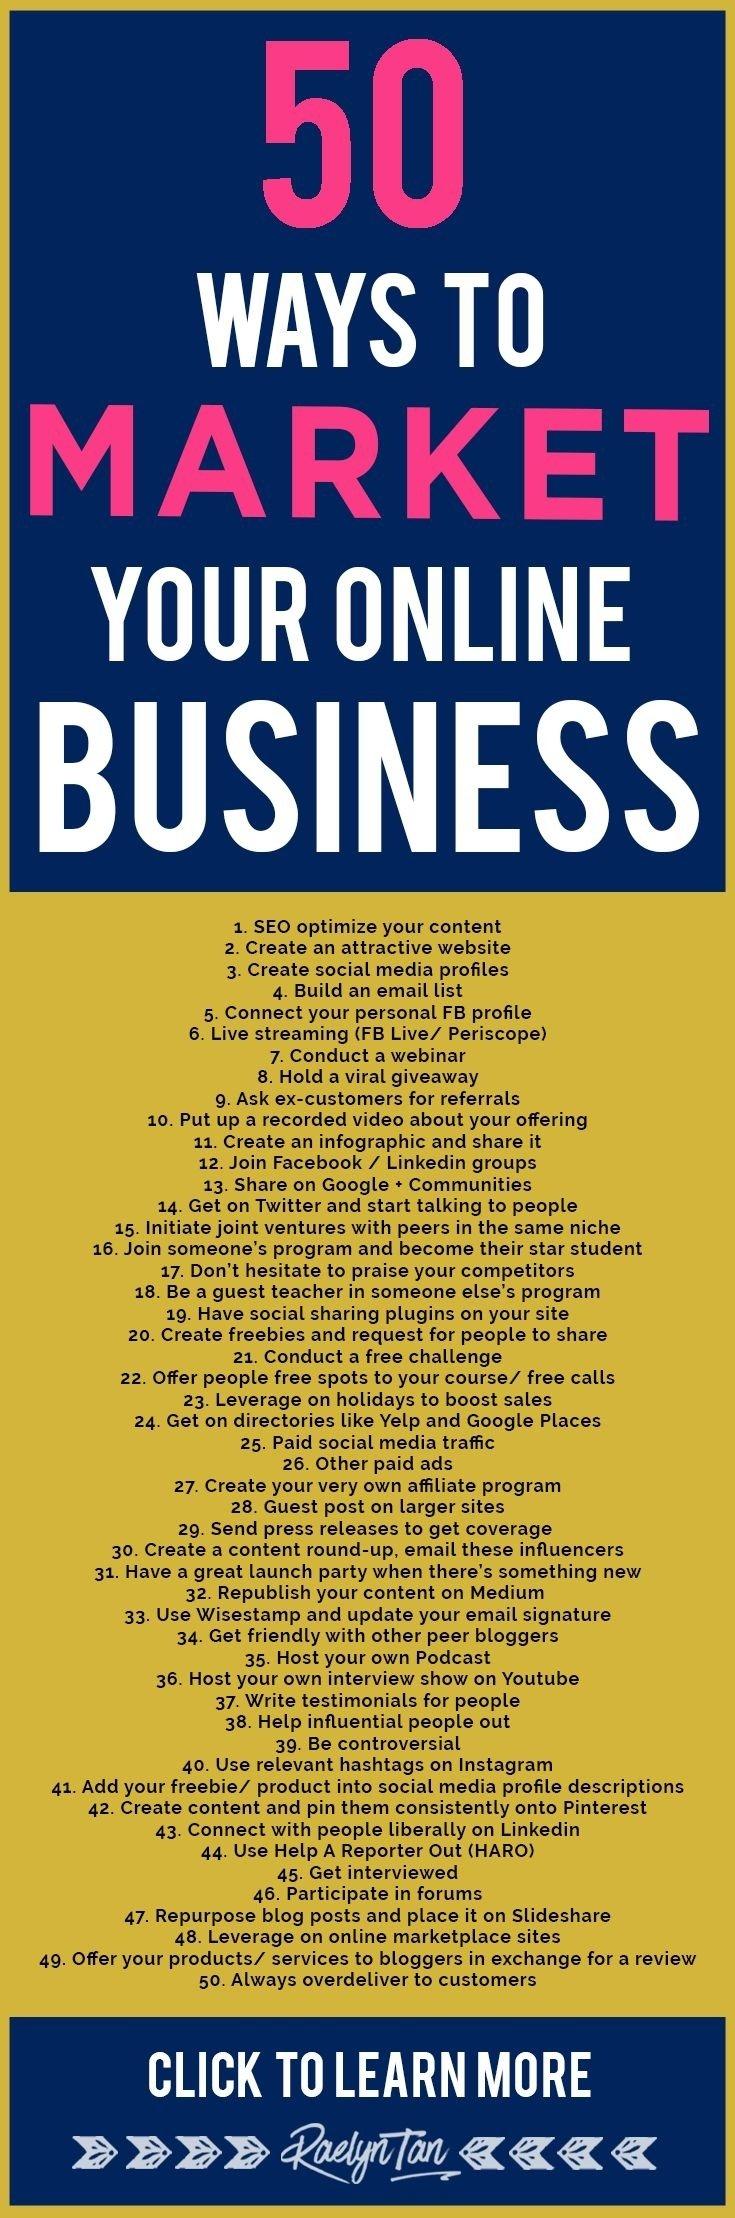 10 Stunning Business To Business Marketing Ideas 7730 best business marketing images on pinterest social media 2020